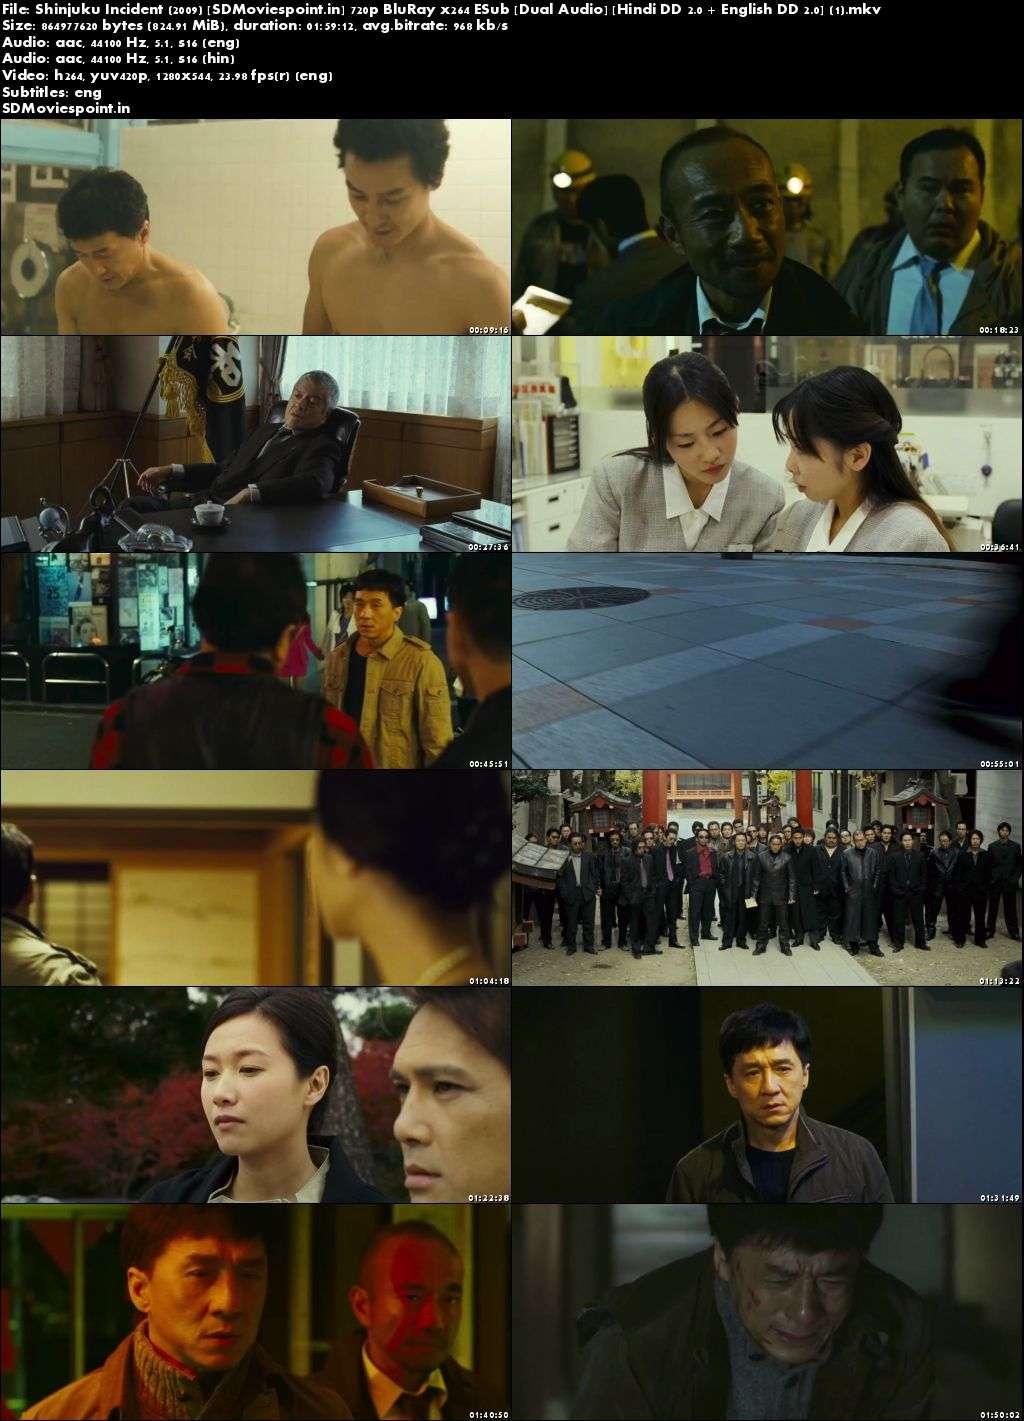 Screen shots Shinjuku Incident 2009 Full HD Movie Download Dual Audio Free 720p